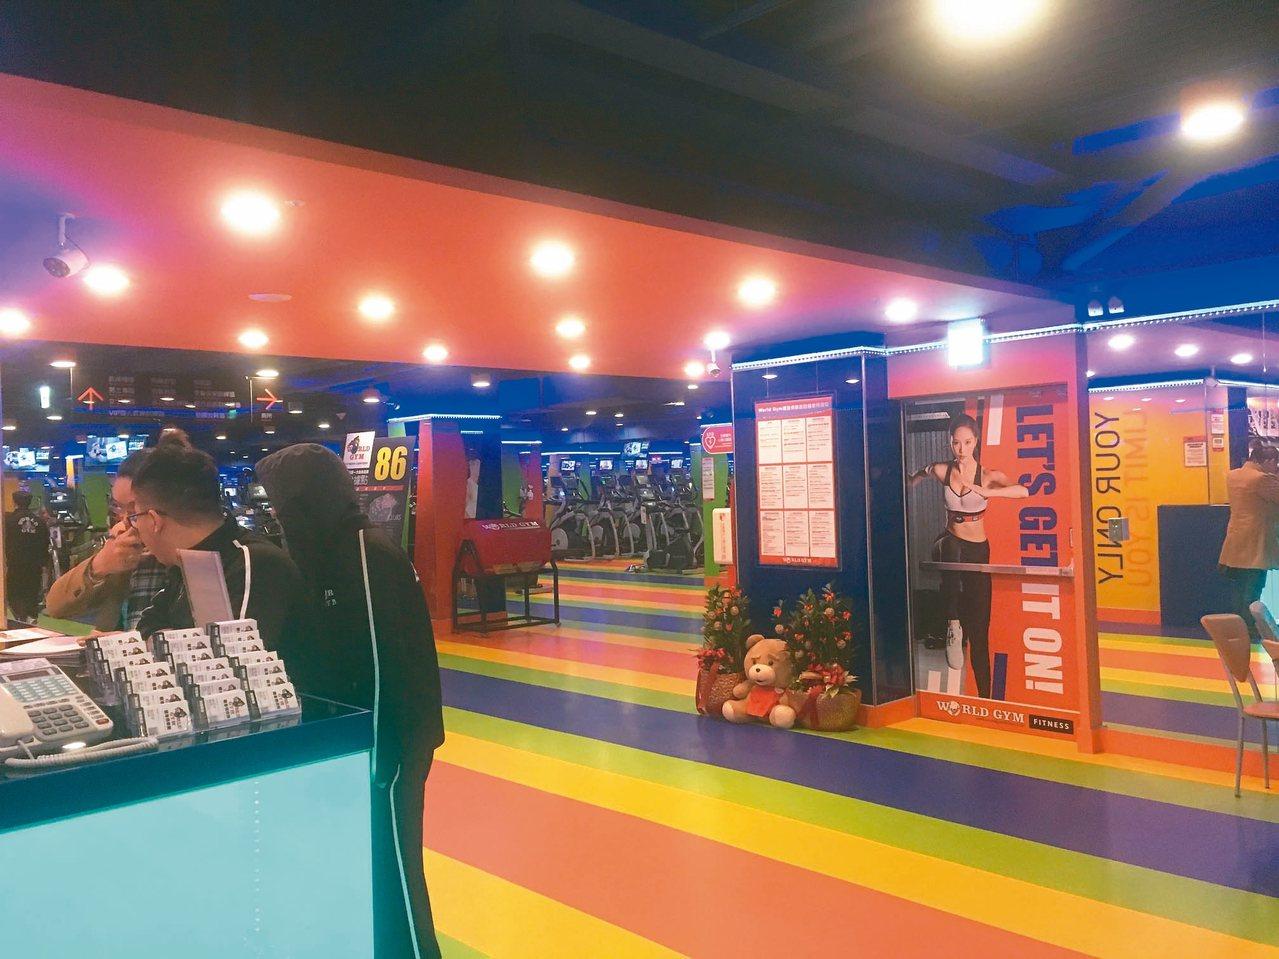 World Gym新設立的分店未完成竣工查驗就營運,被罰12萬元。 記者張世杰/...